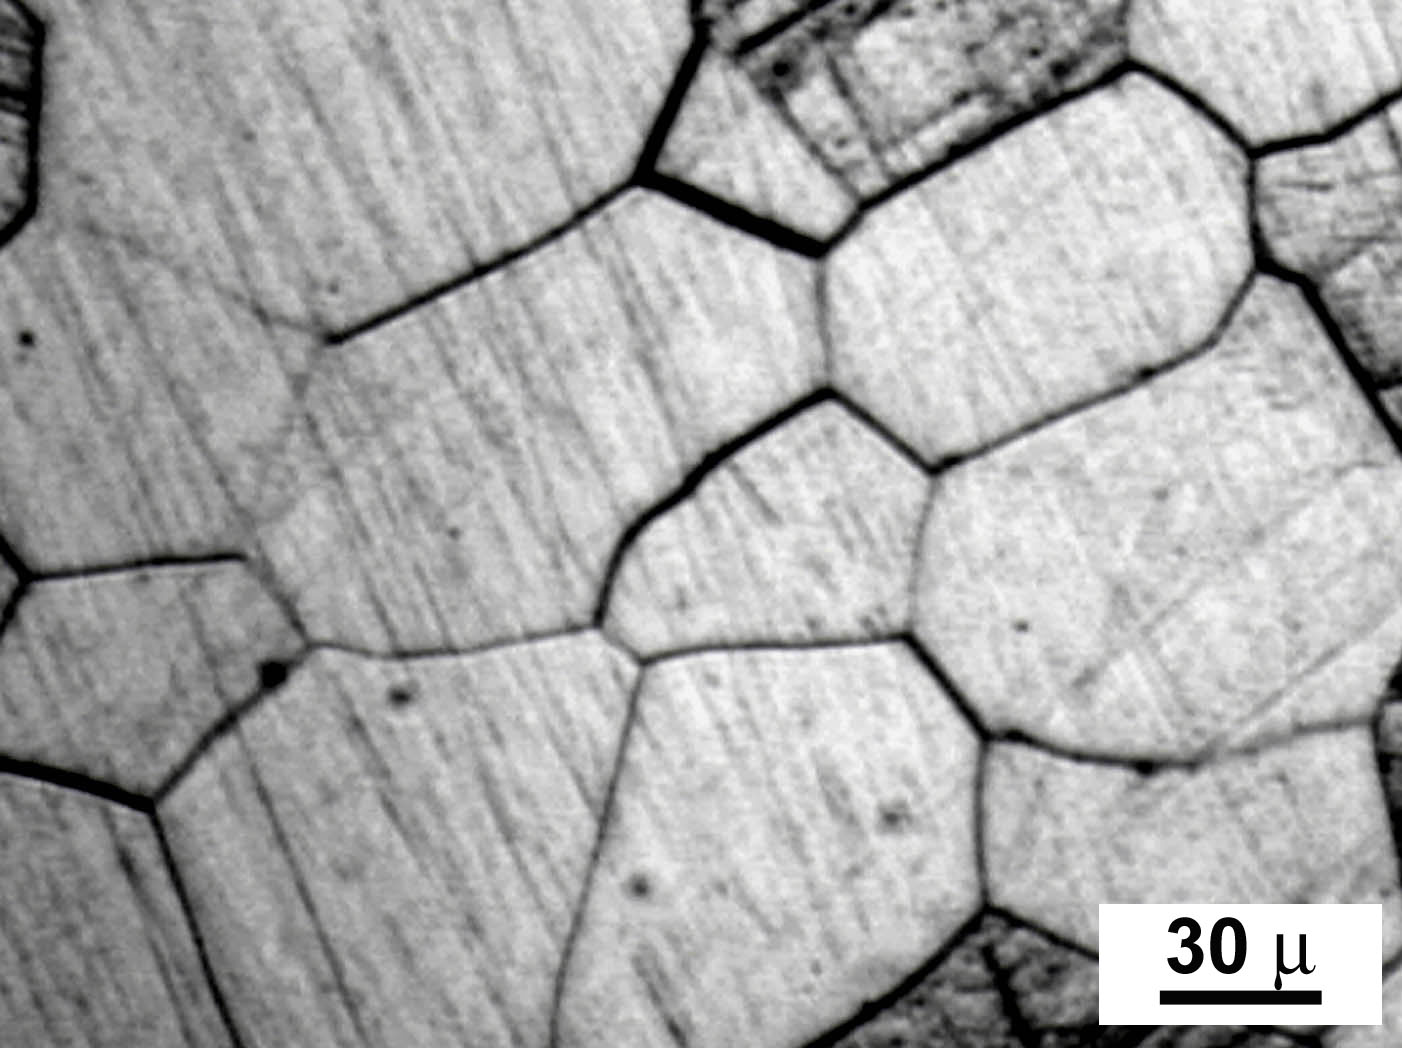 Med mikrostruktur menes en struktur som kun kan observeres med mikroskop.